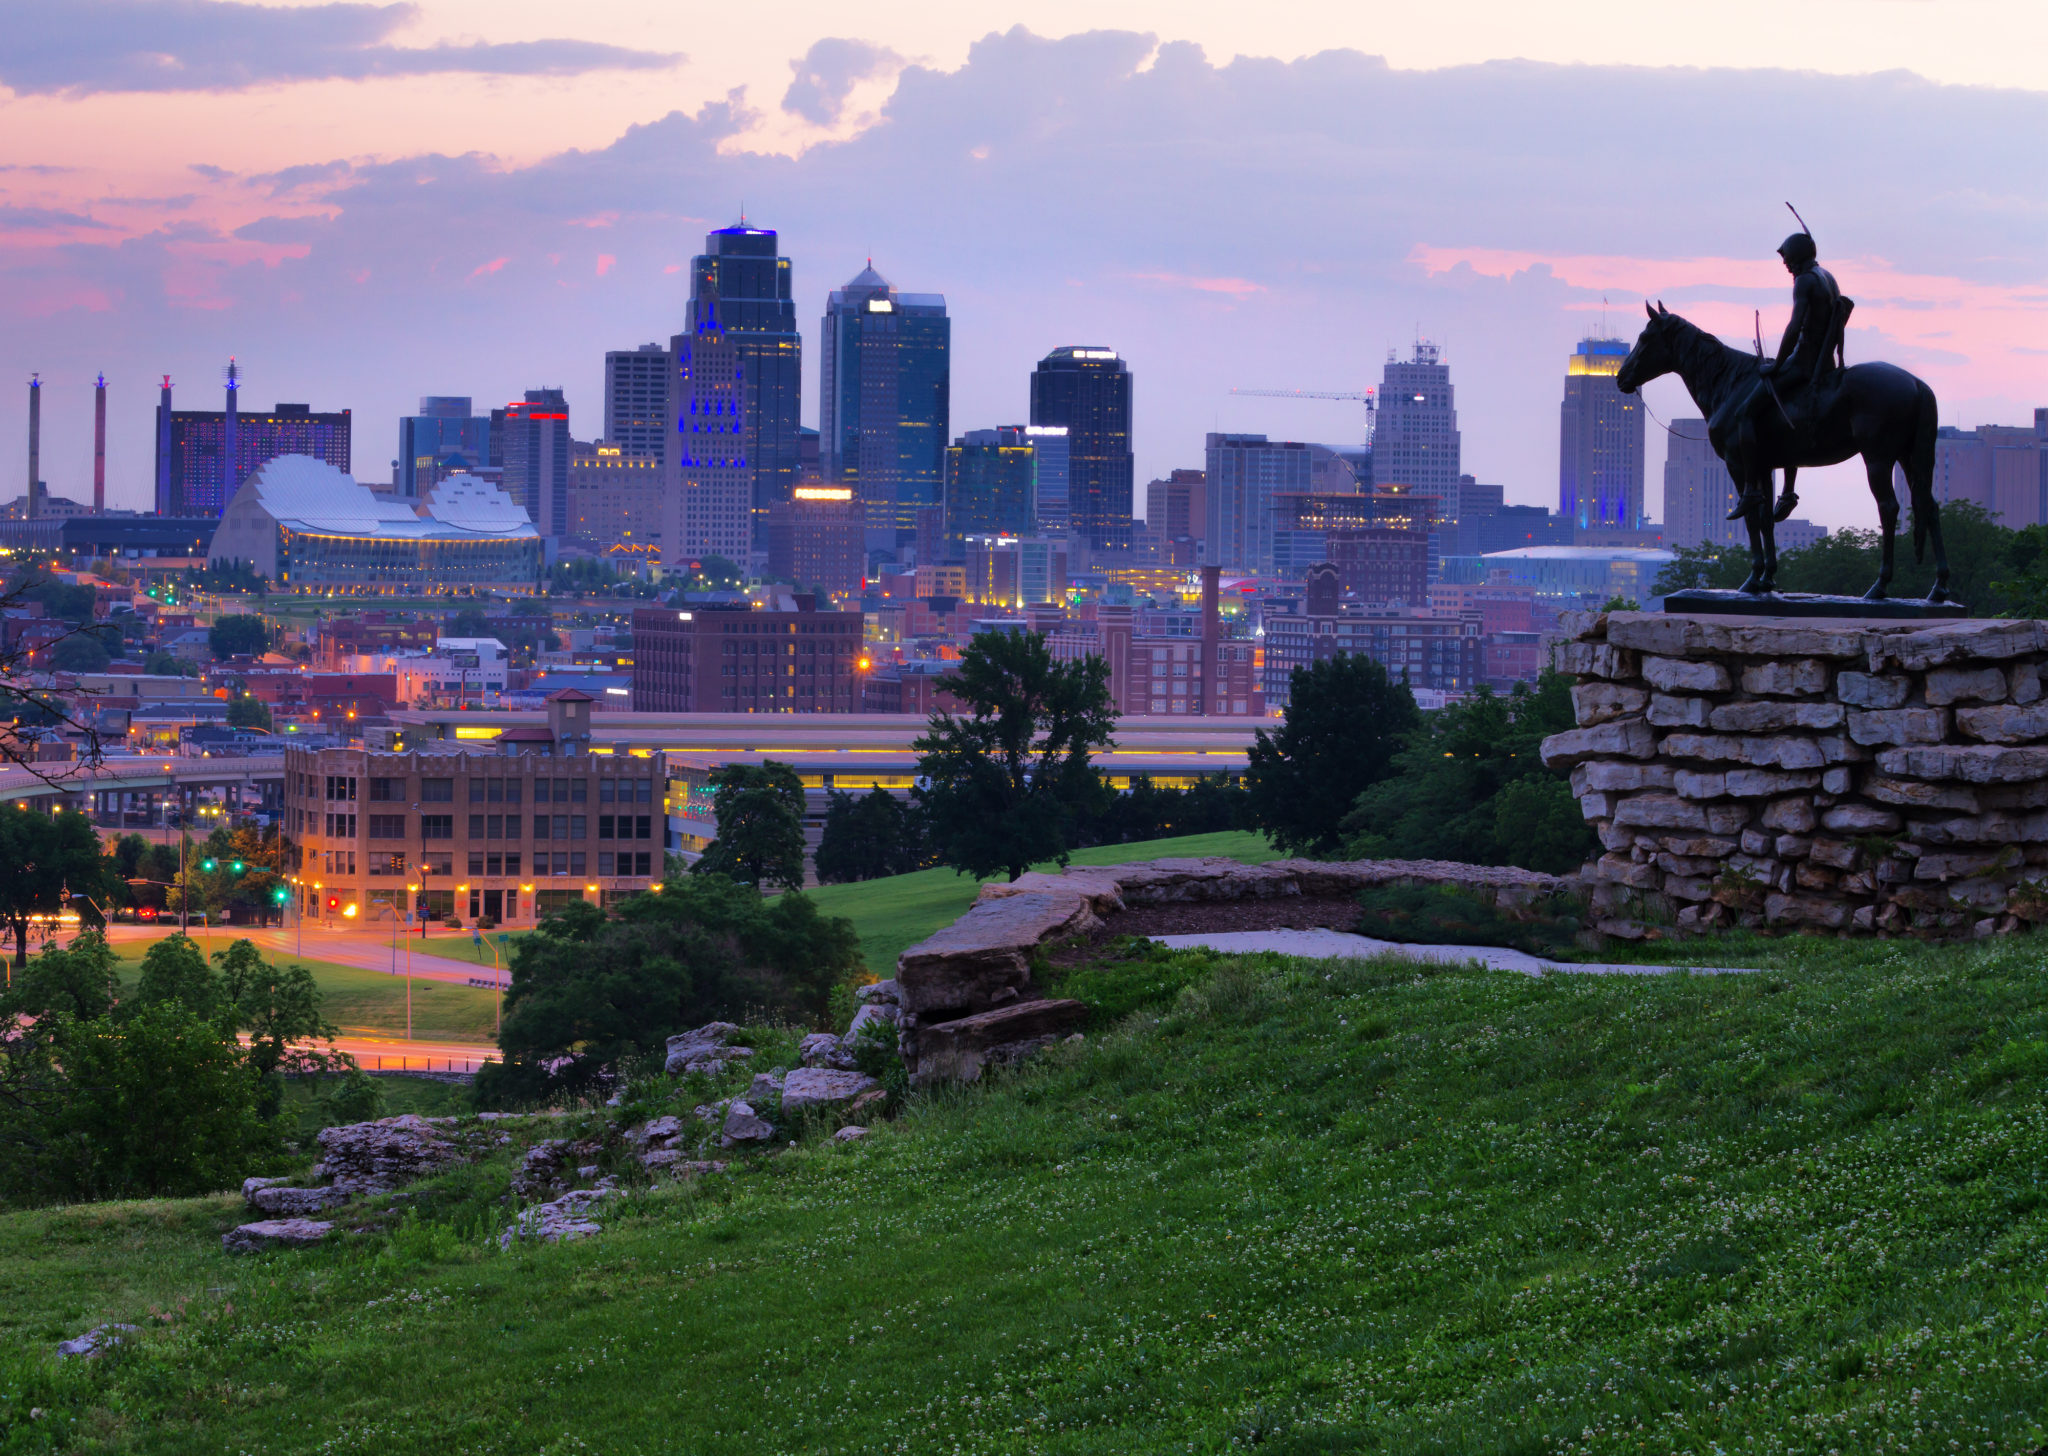 Kansas City Paris Of The Plains